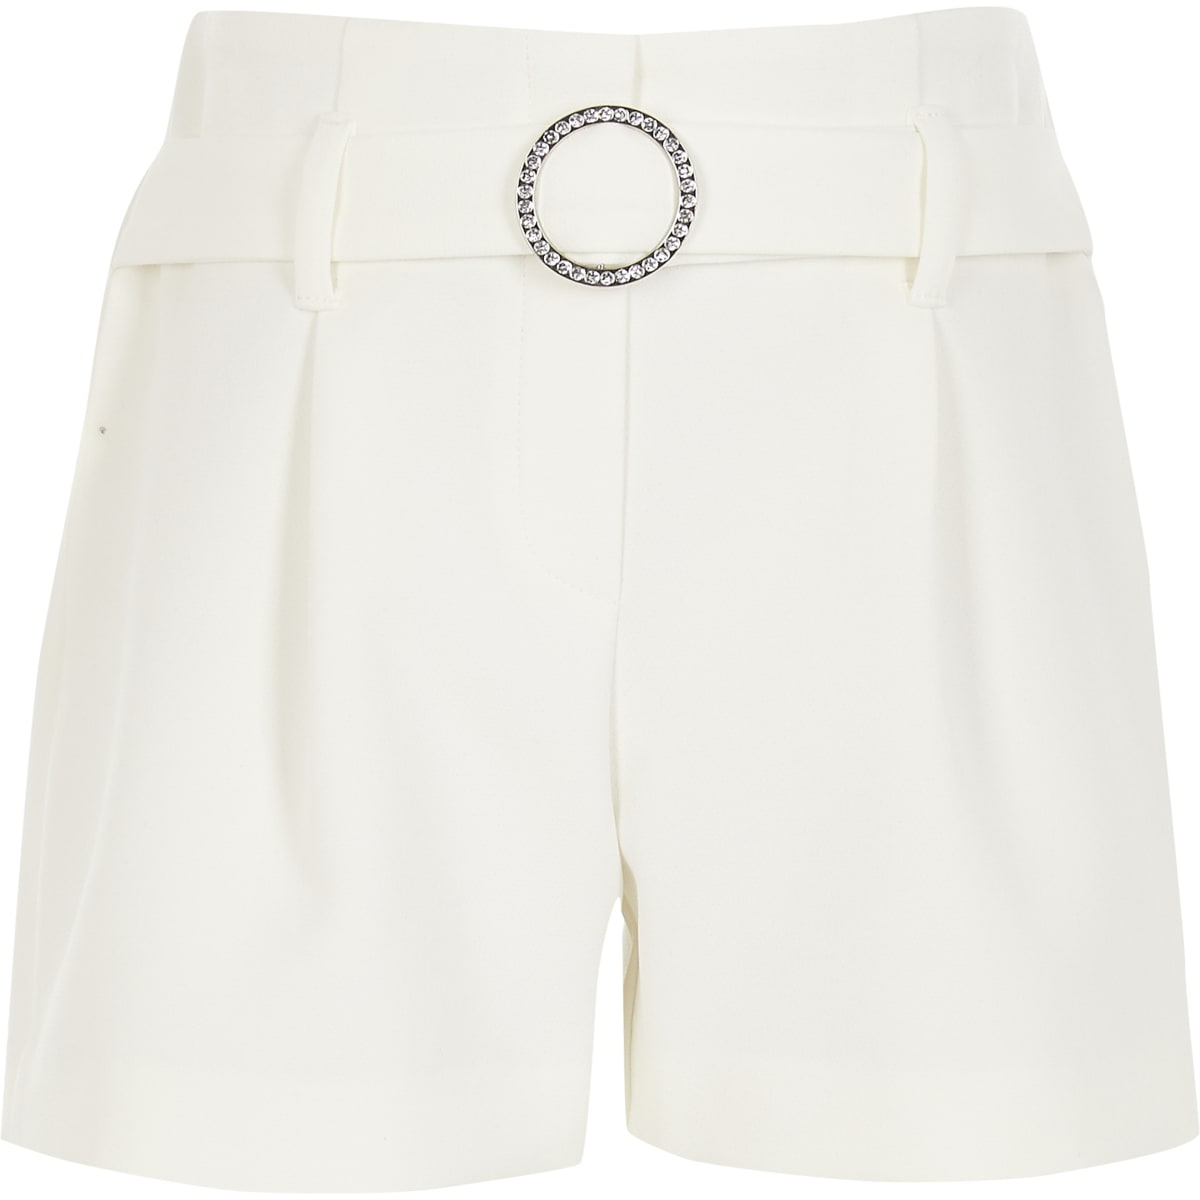 Girls white diamante belted shorts